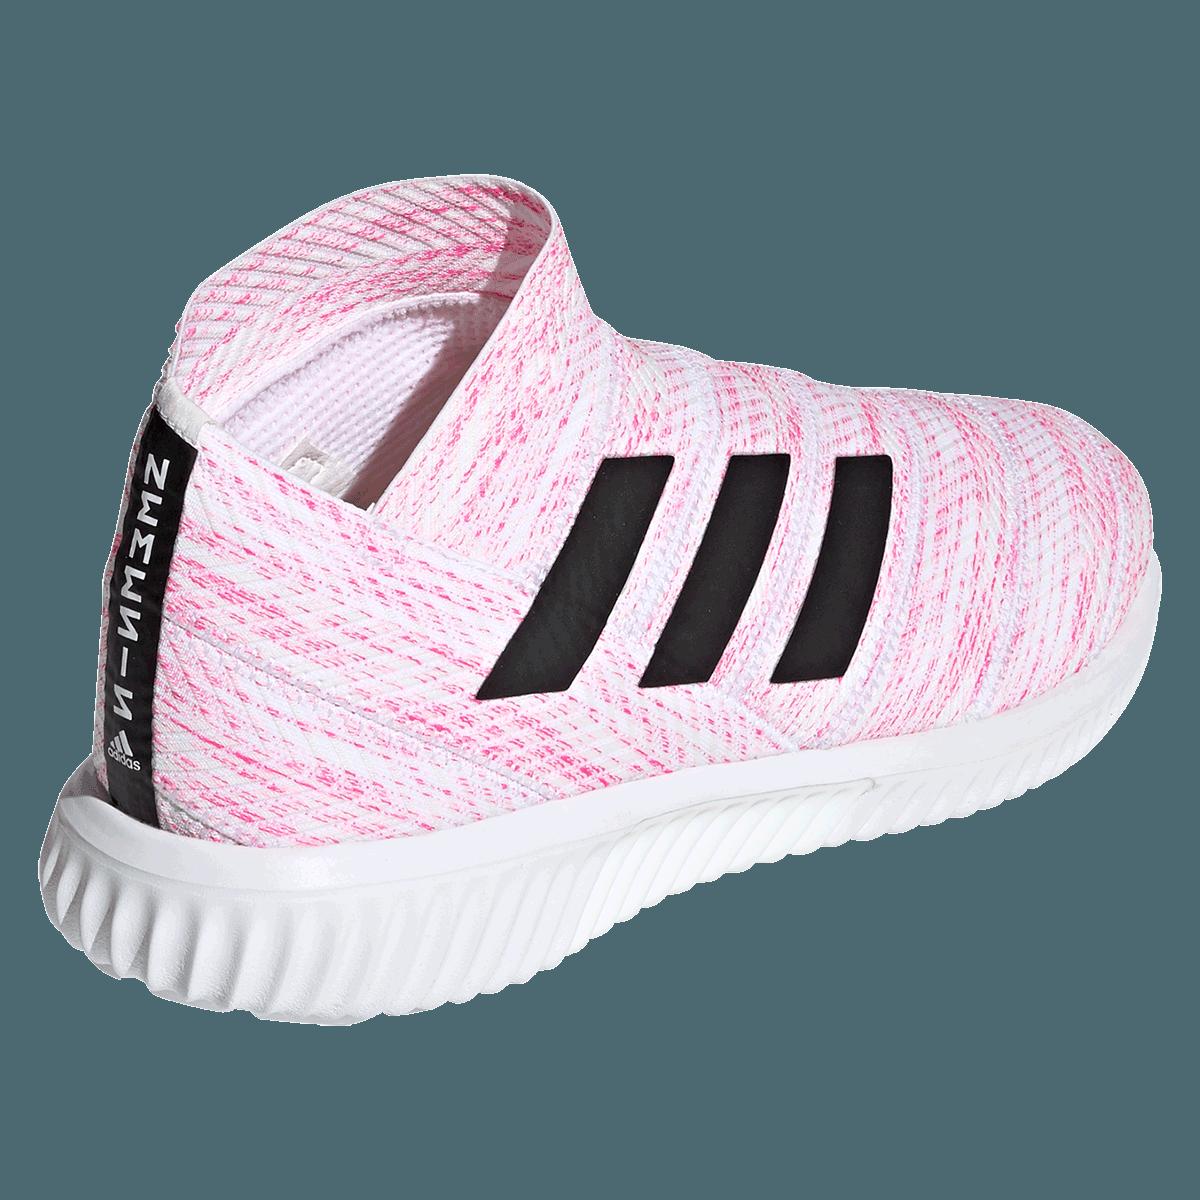 Chaussures adidas Nemeziz 18.1 TR blanc/rose vif - Boutique football